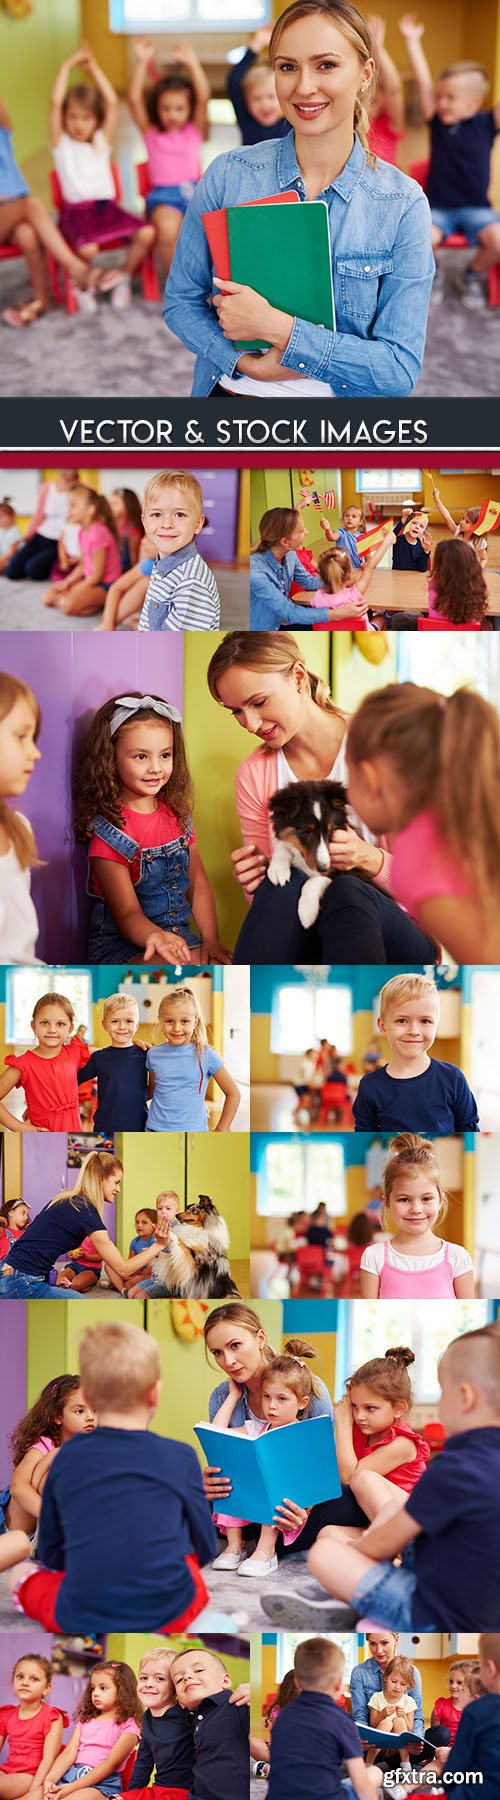 Preschool education children and teacher on occupation